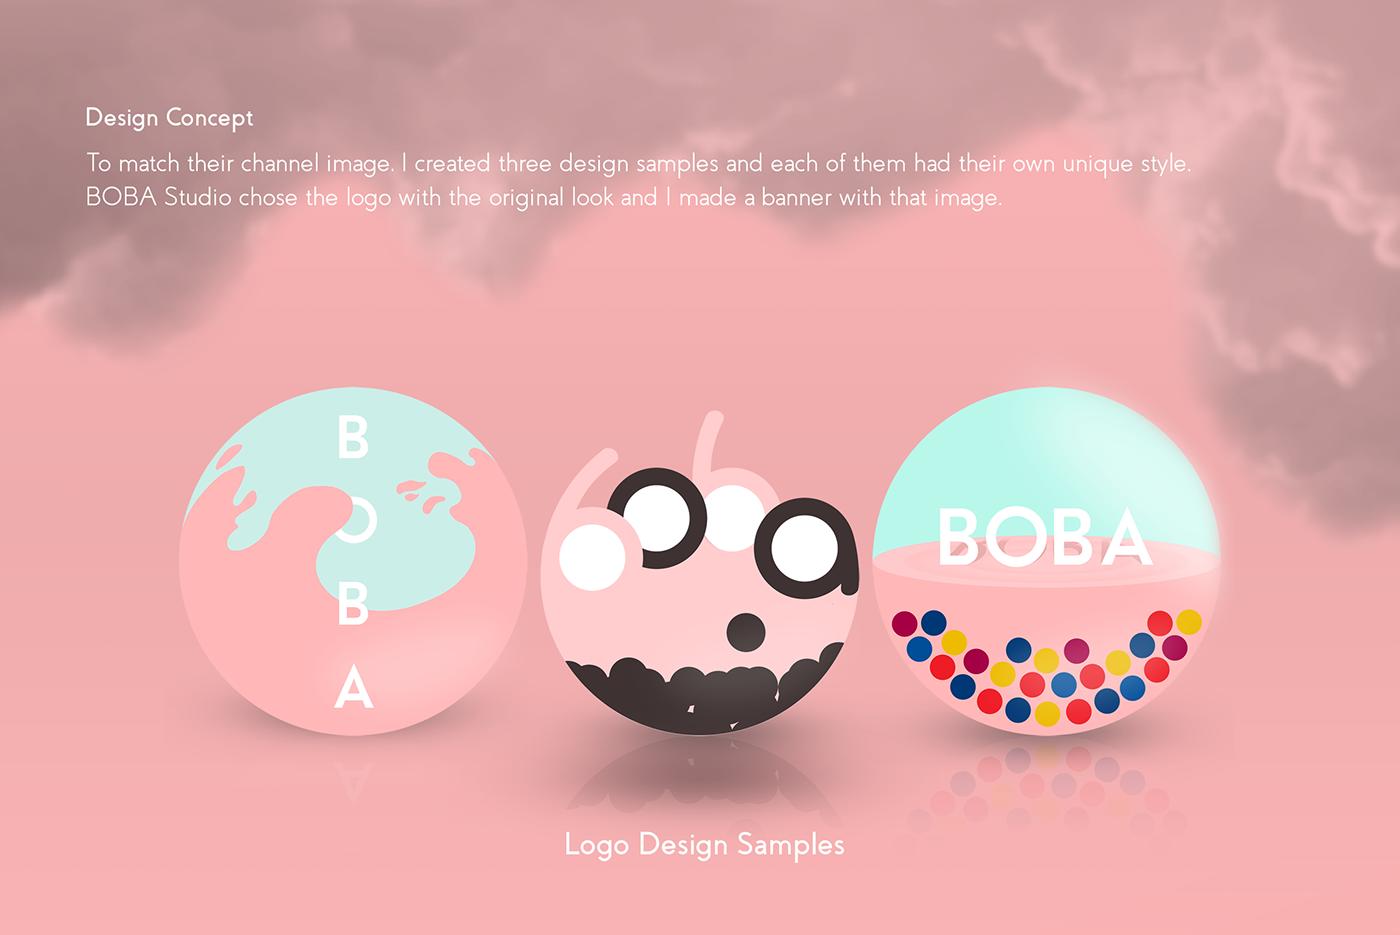 Design Banner Boba - desain spanduk kreatif